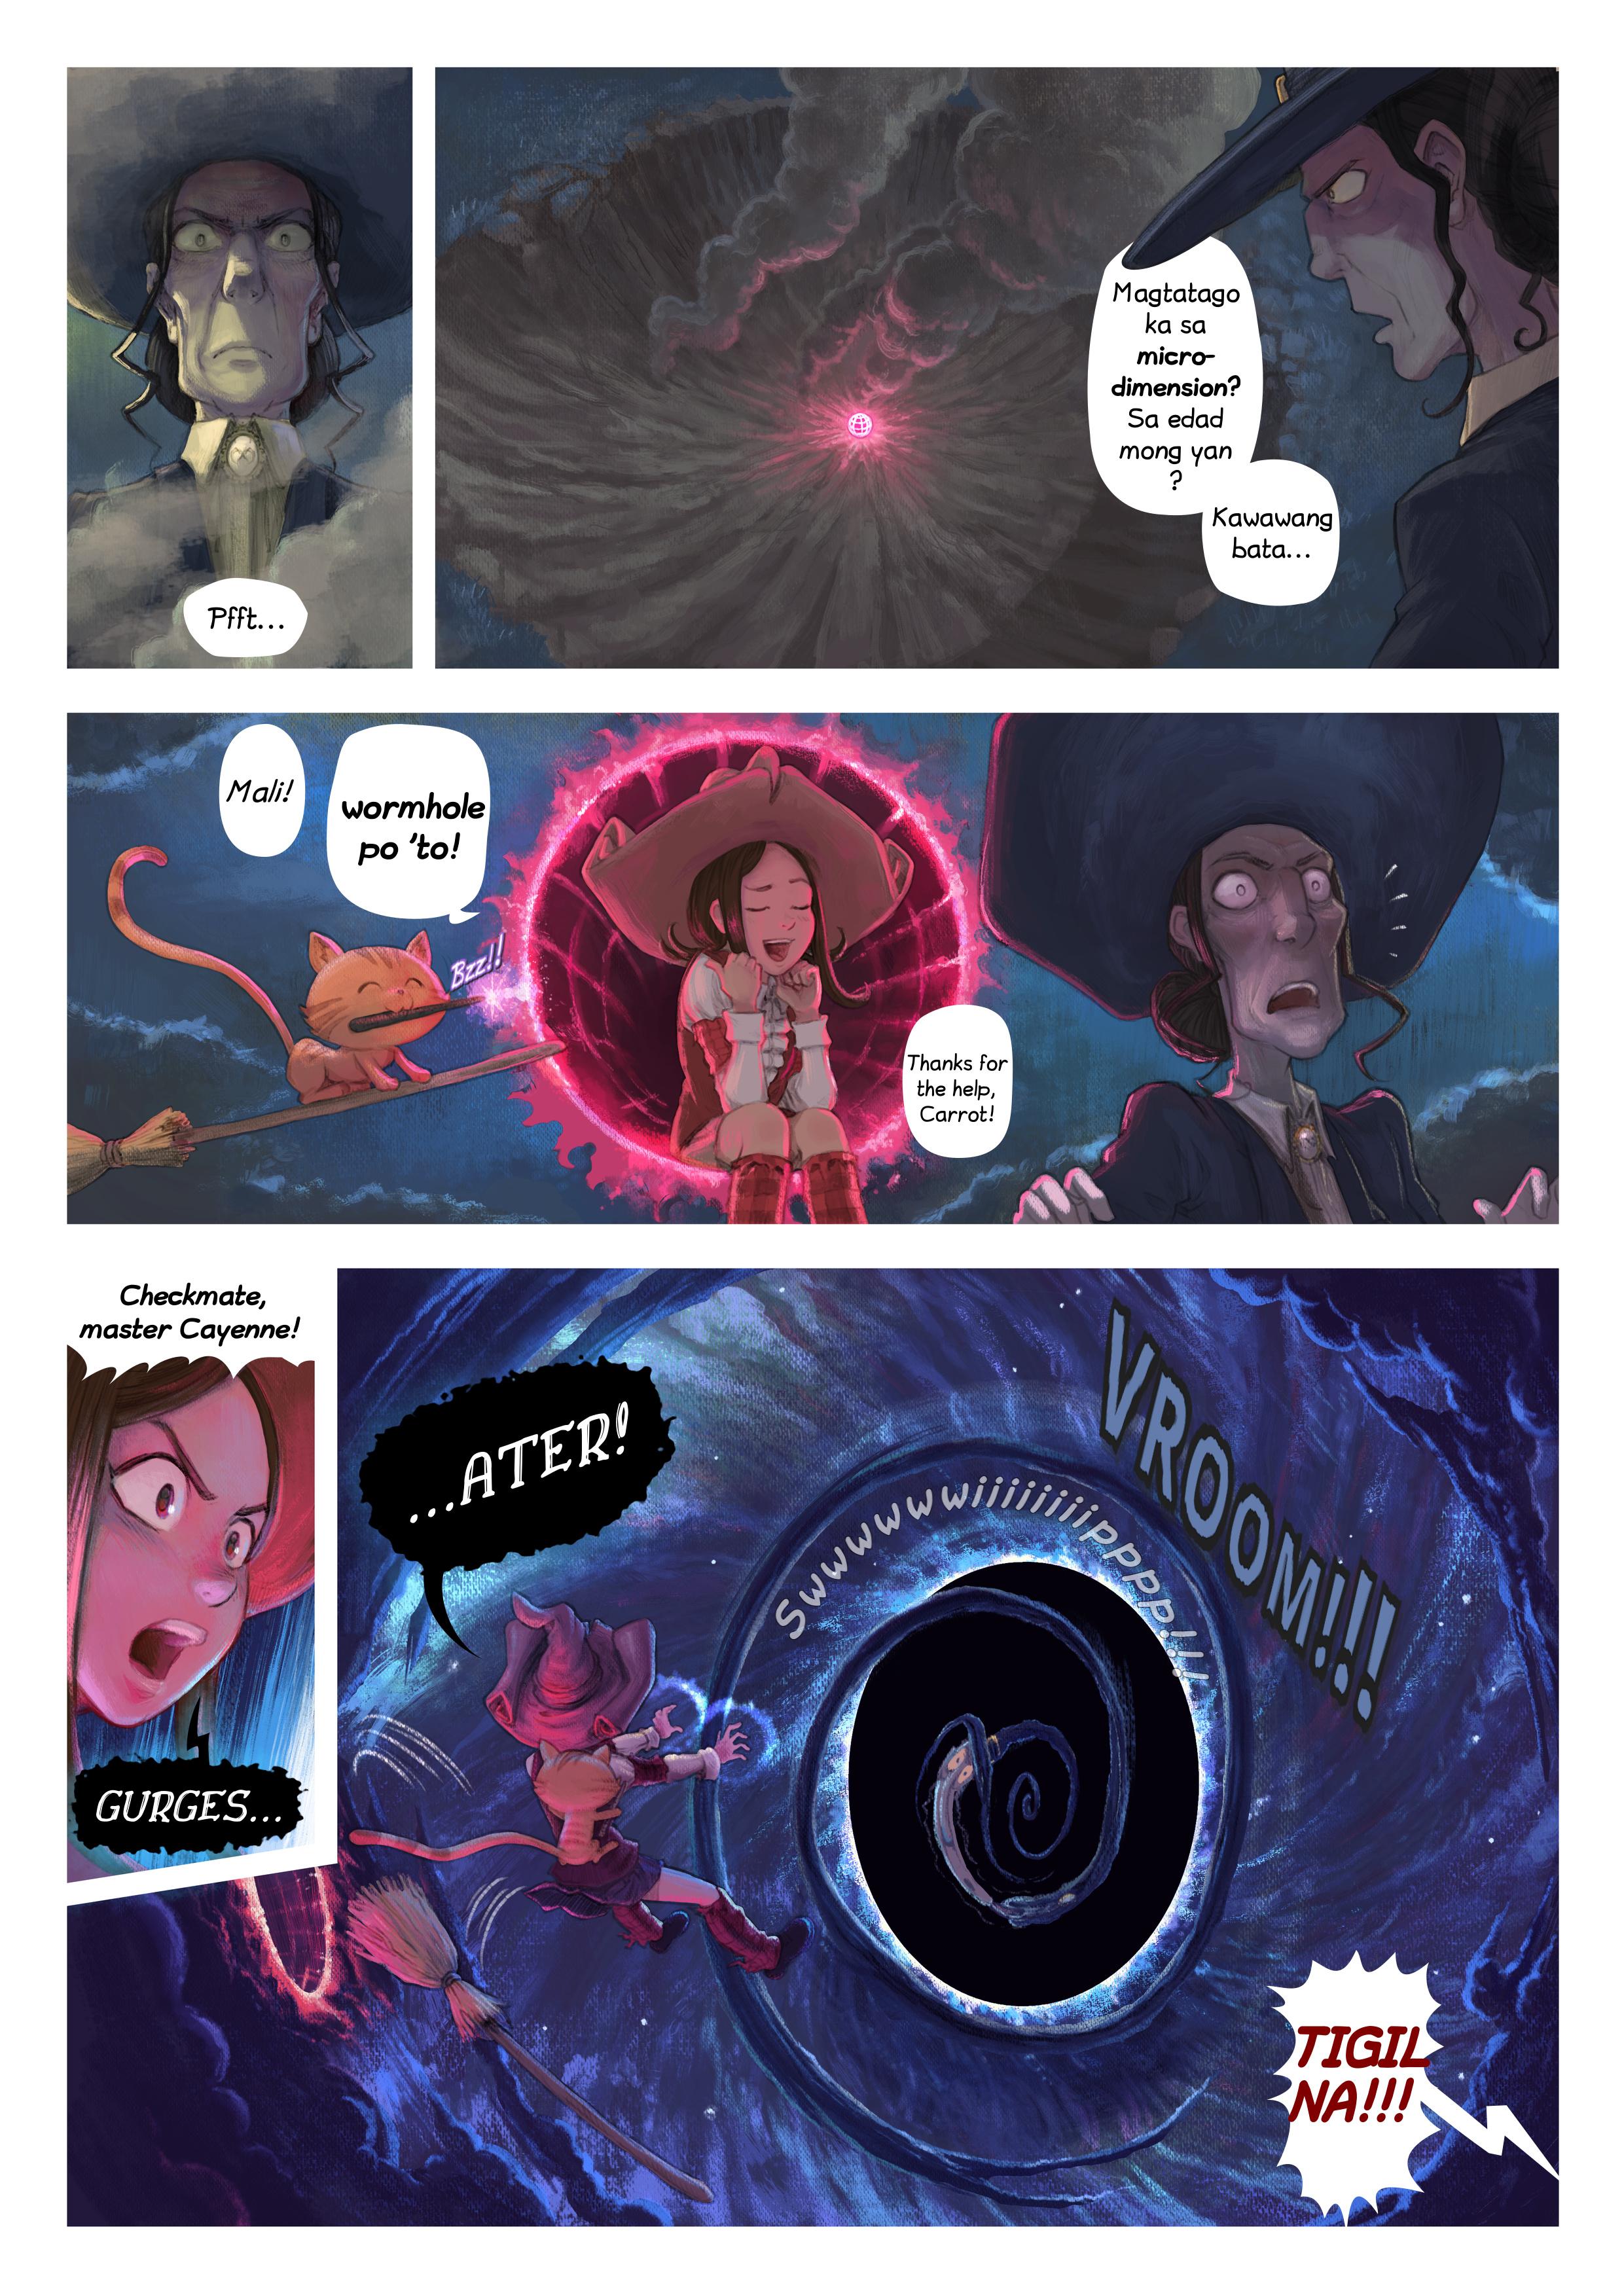 Episode 31: Matira Matibay, Page 5